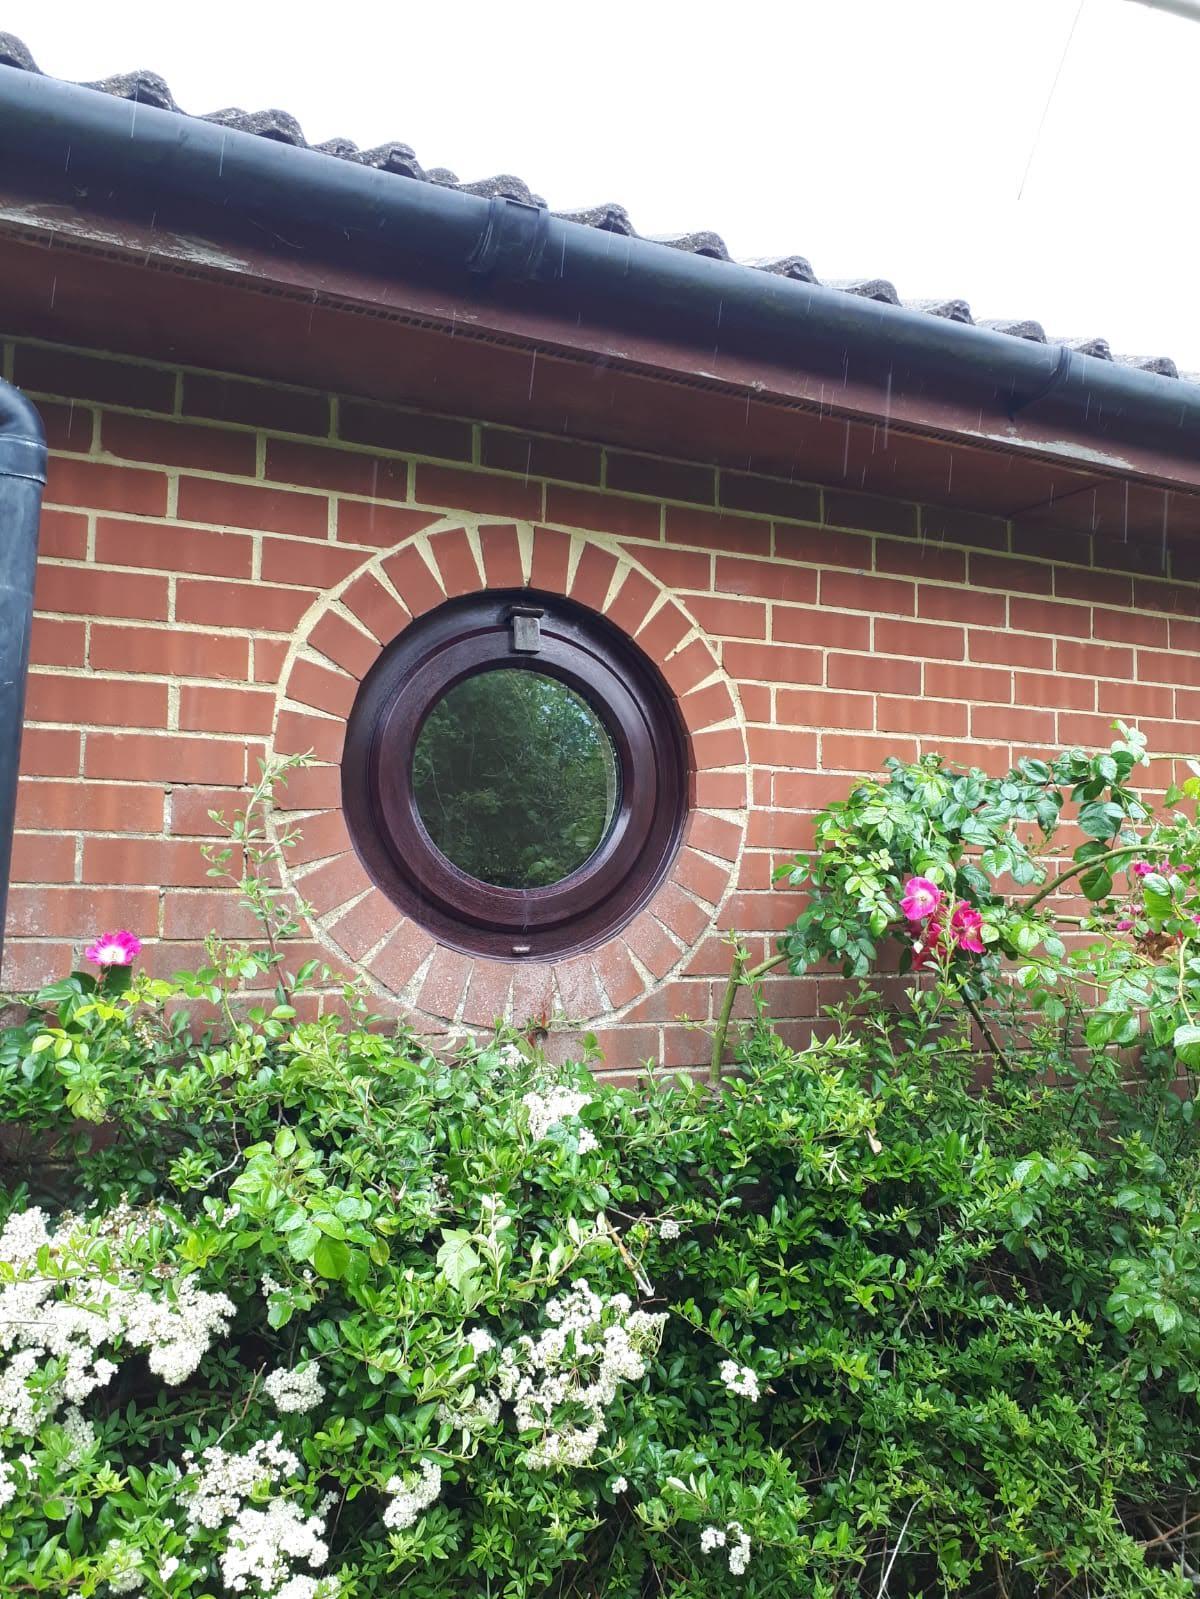 Circular shaped window design by 21st century.